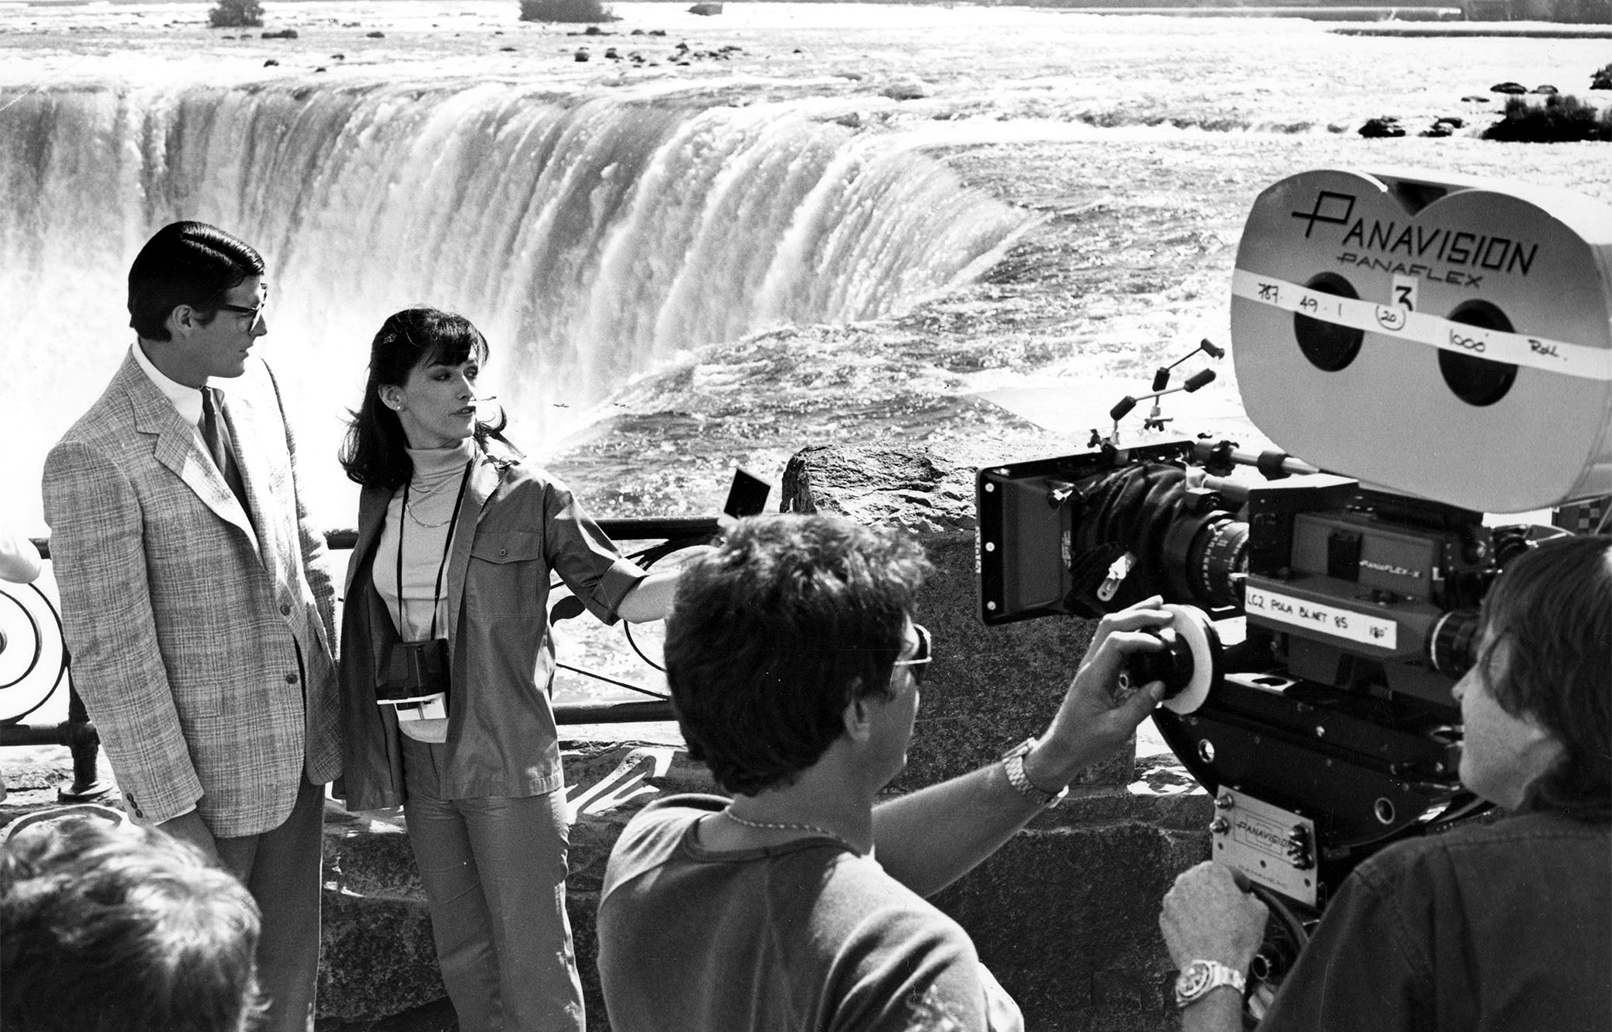 RIP Margot Kidder: Kidder and Christopher Reeve on location in Niagara Falls